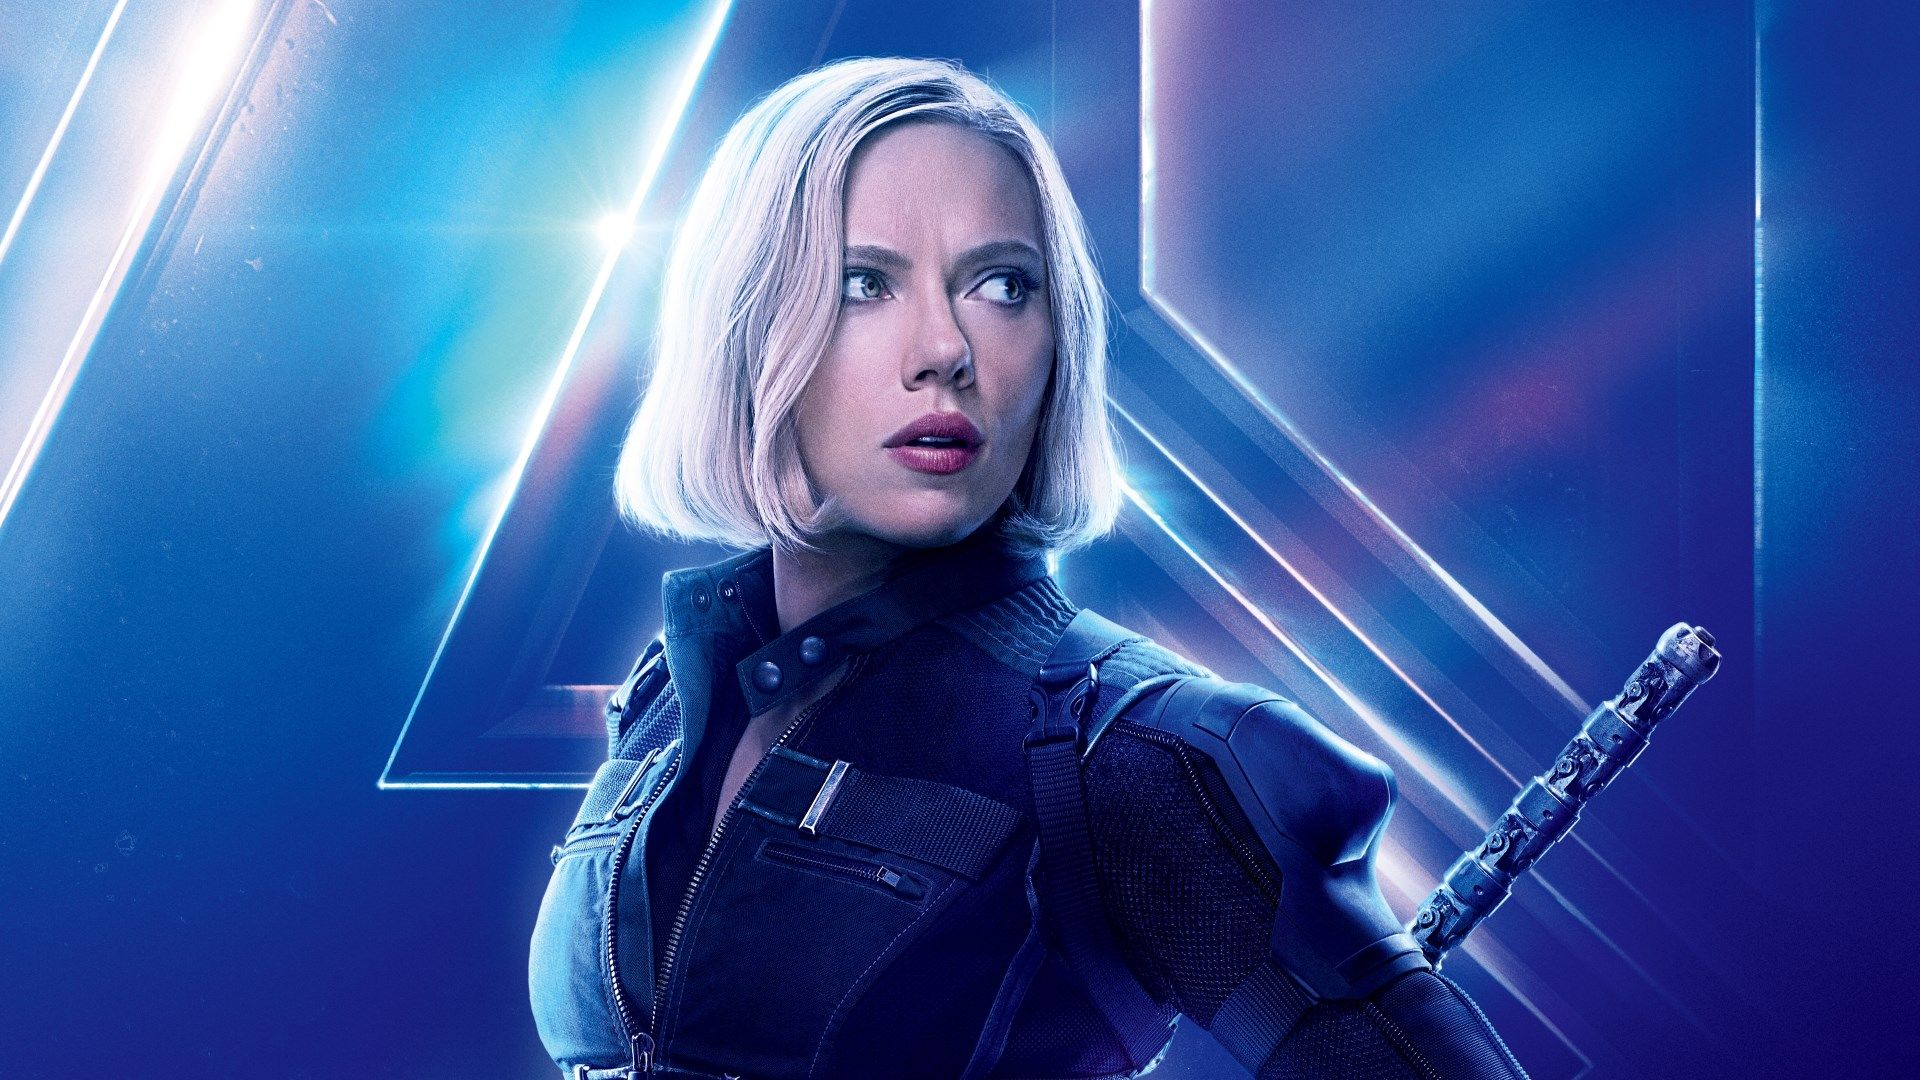 Black Widow Infinity War Hd Wallpaper Black Widow Movie Avengers Infinity War Avengers